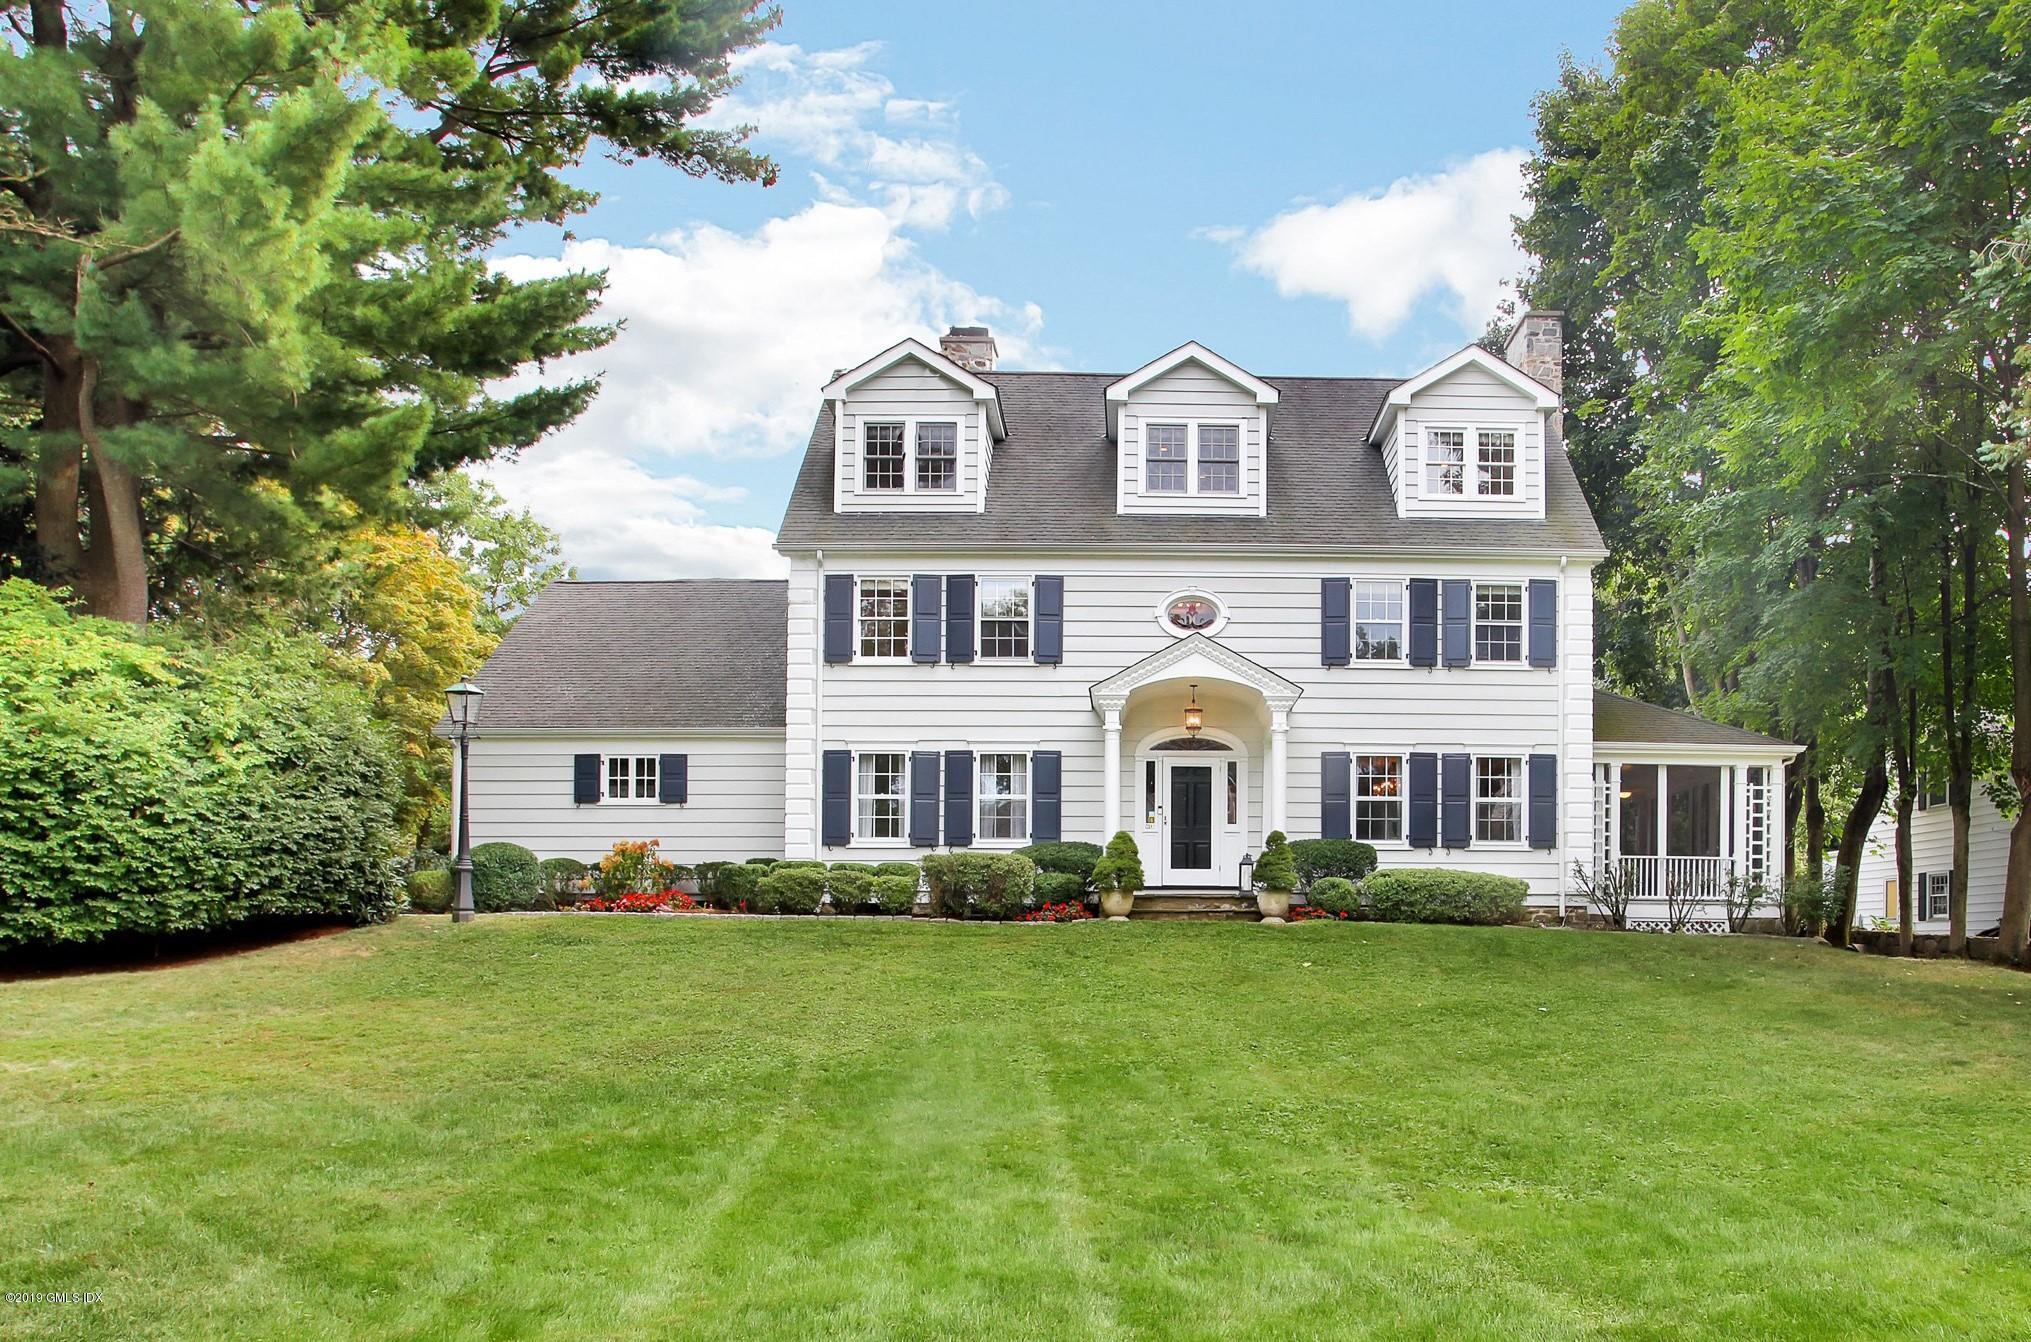 15 Anderson Road,Greenwich,Connecticut 06830,6 Bedrooms Bedrooms,4 BathroomsBathrooms,Single family,Anderson,108034